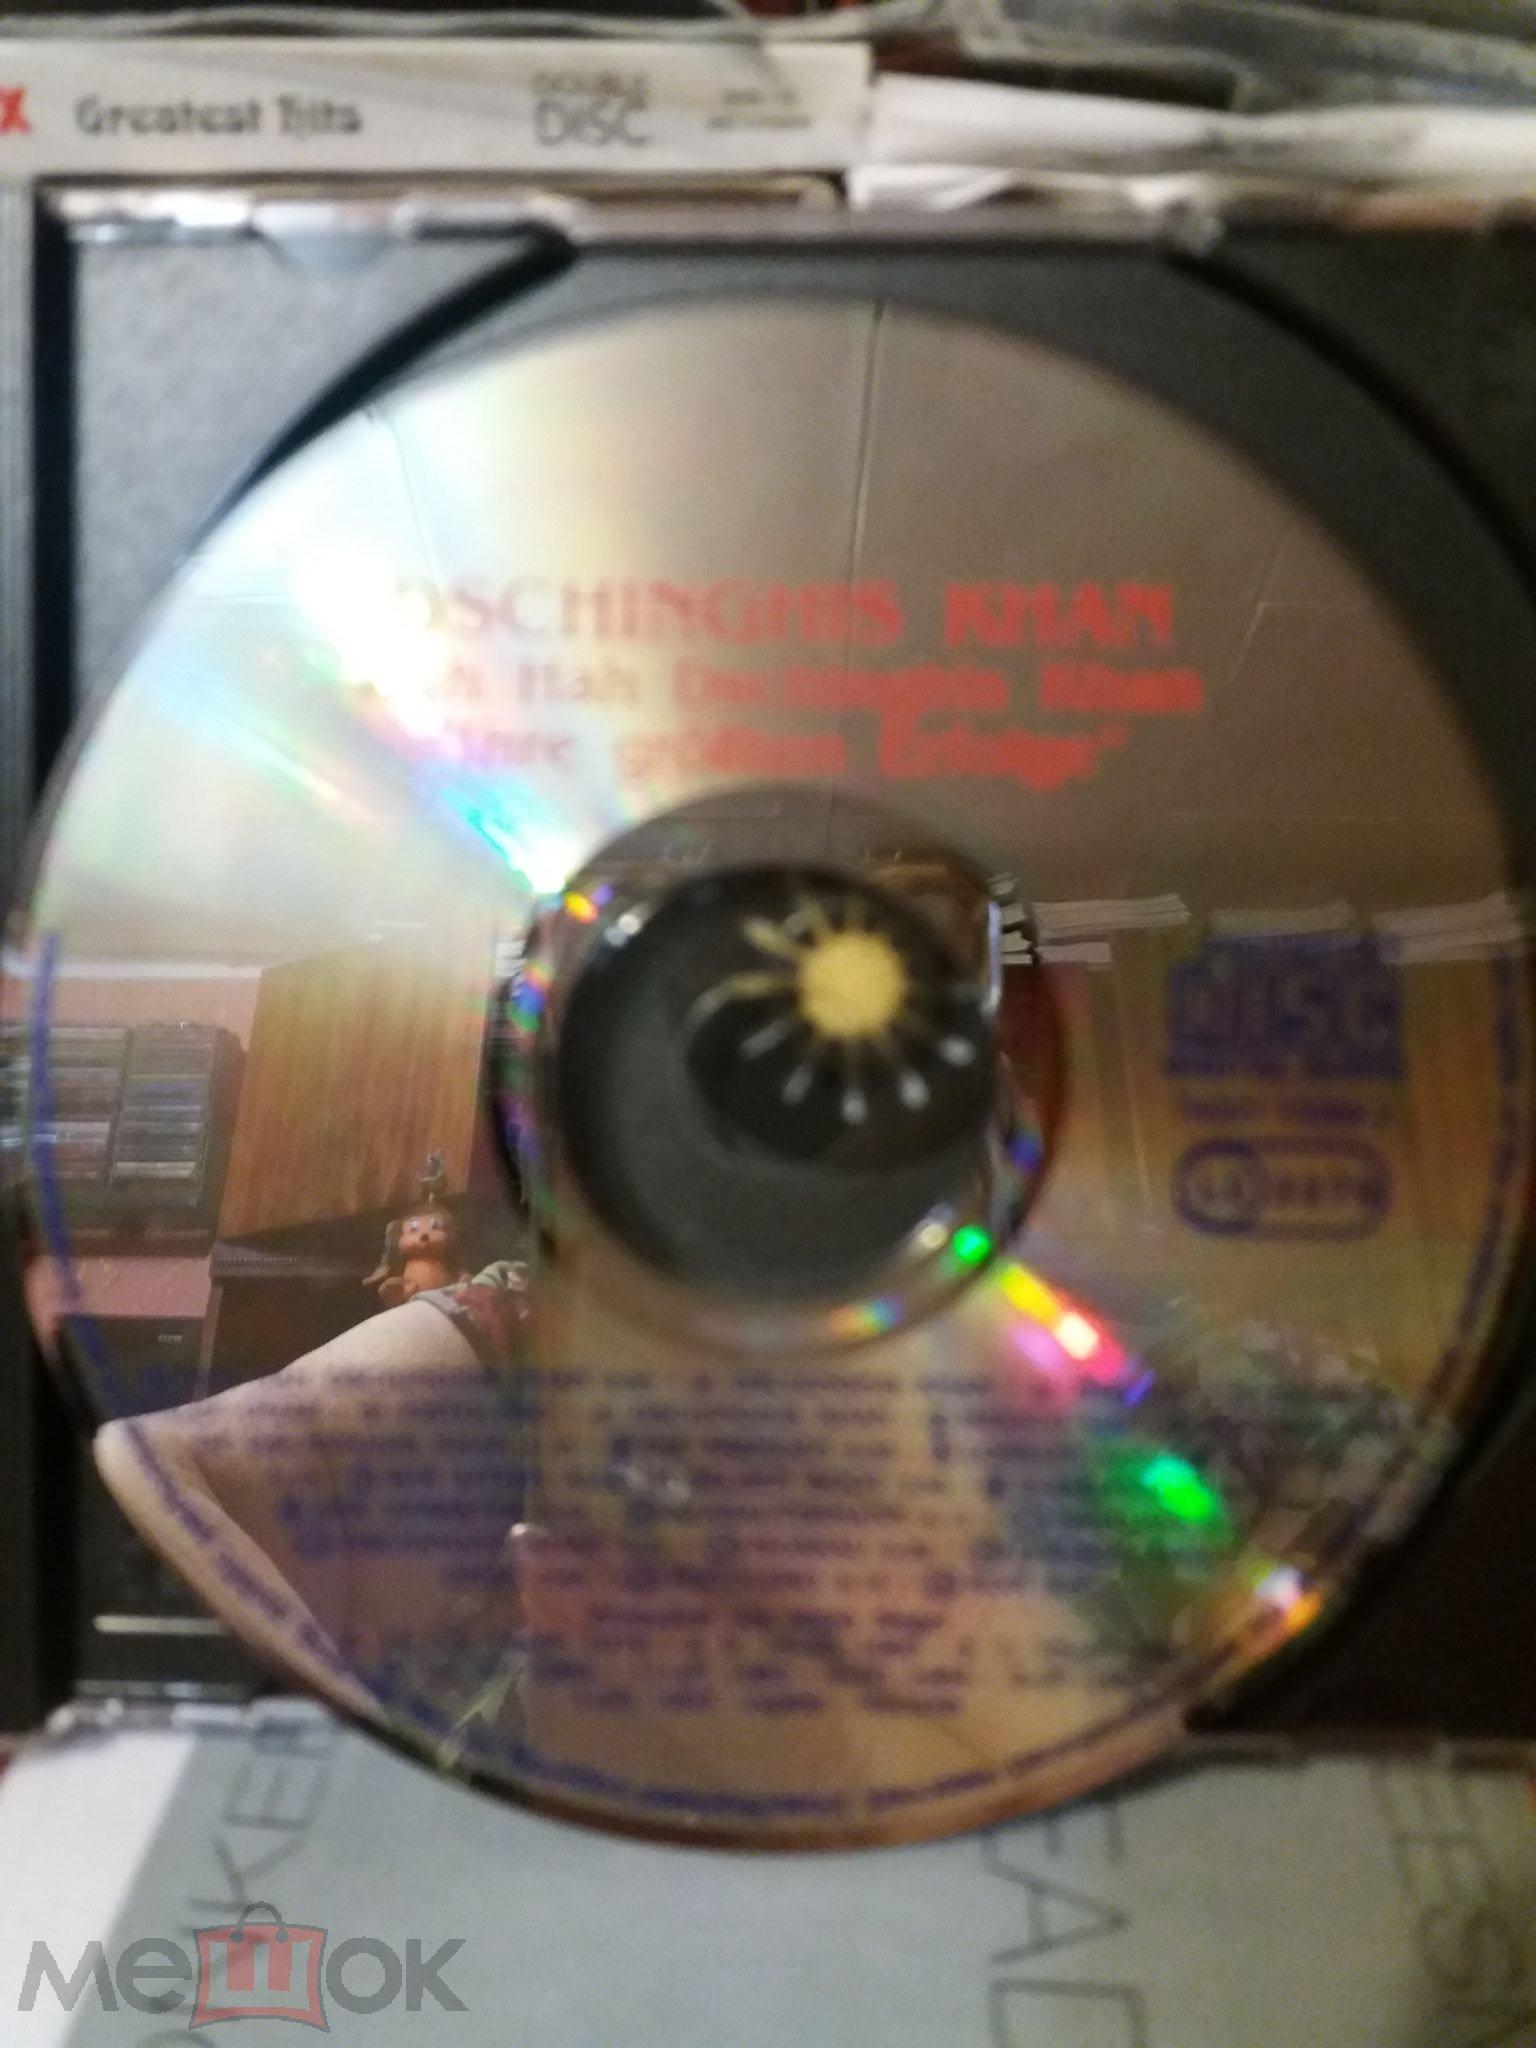 CD HUH HAH DSCHINGHIS KHAN - IHRE GROFTEN ERFOIGE